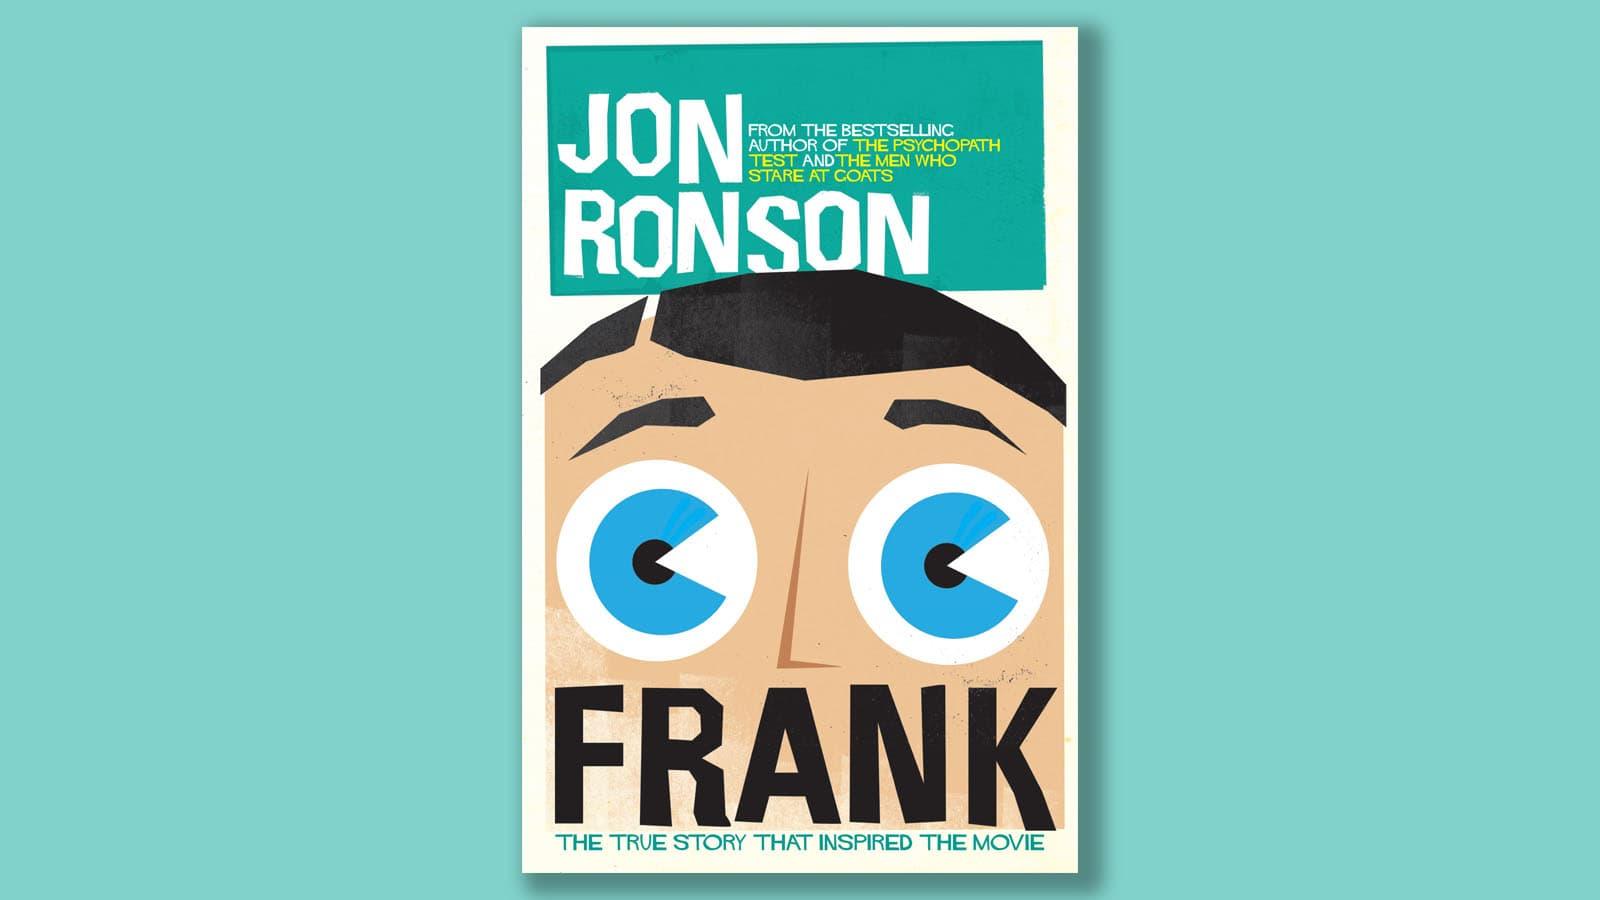 Frank Jon Ronson book